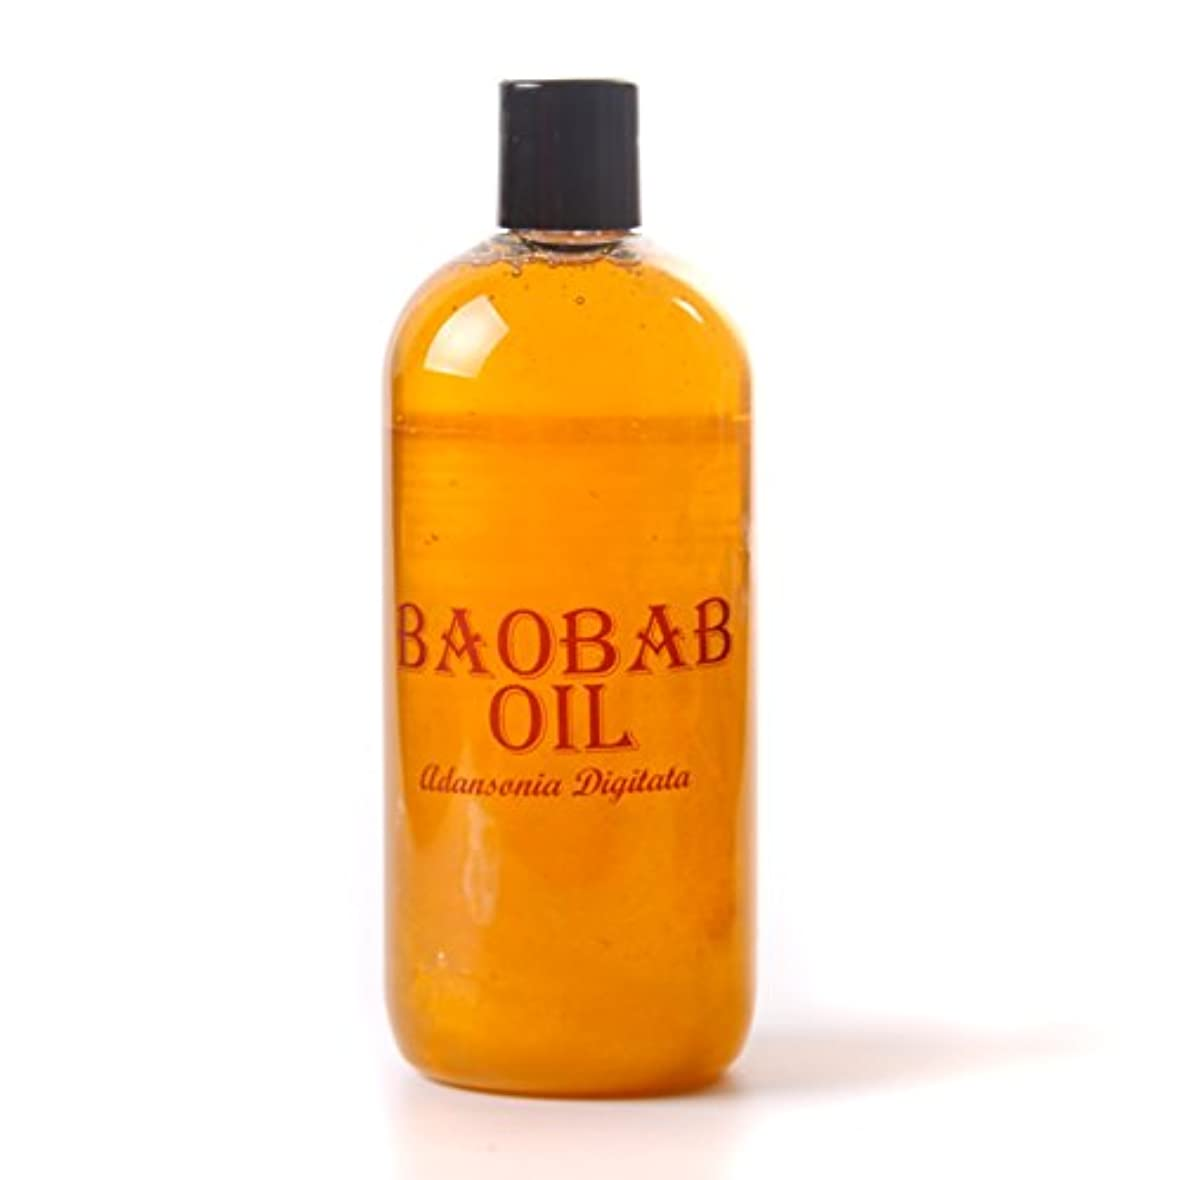 Mystic Moments | Baobab Virgin Carrier Oil - 1 Litre - 100% Pure